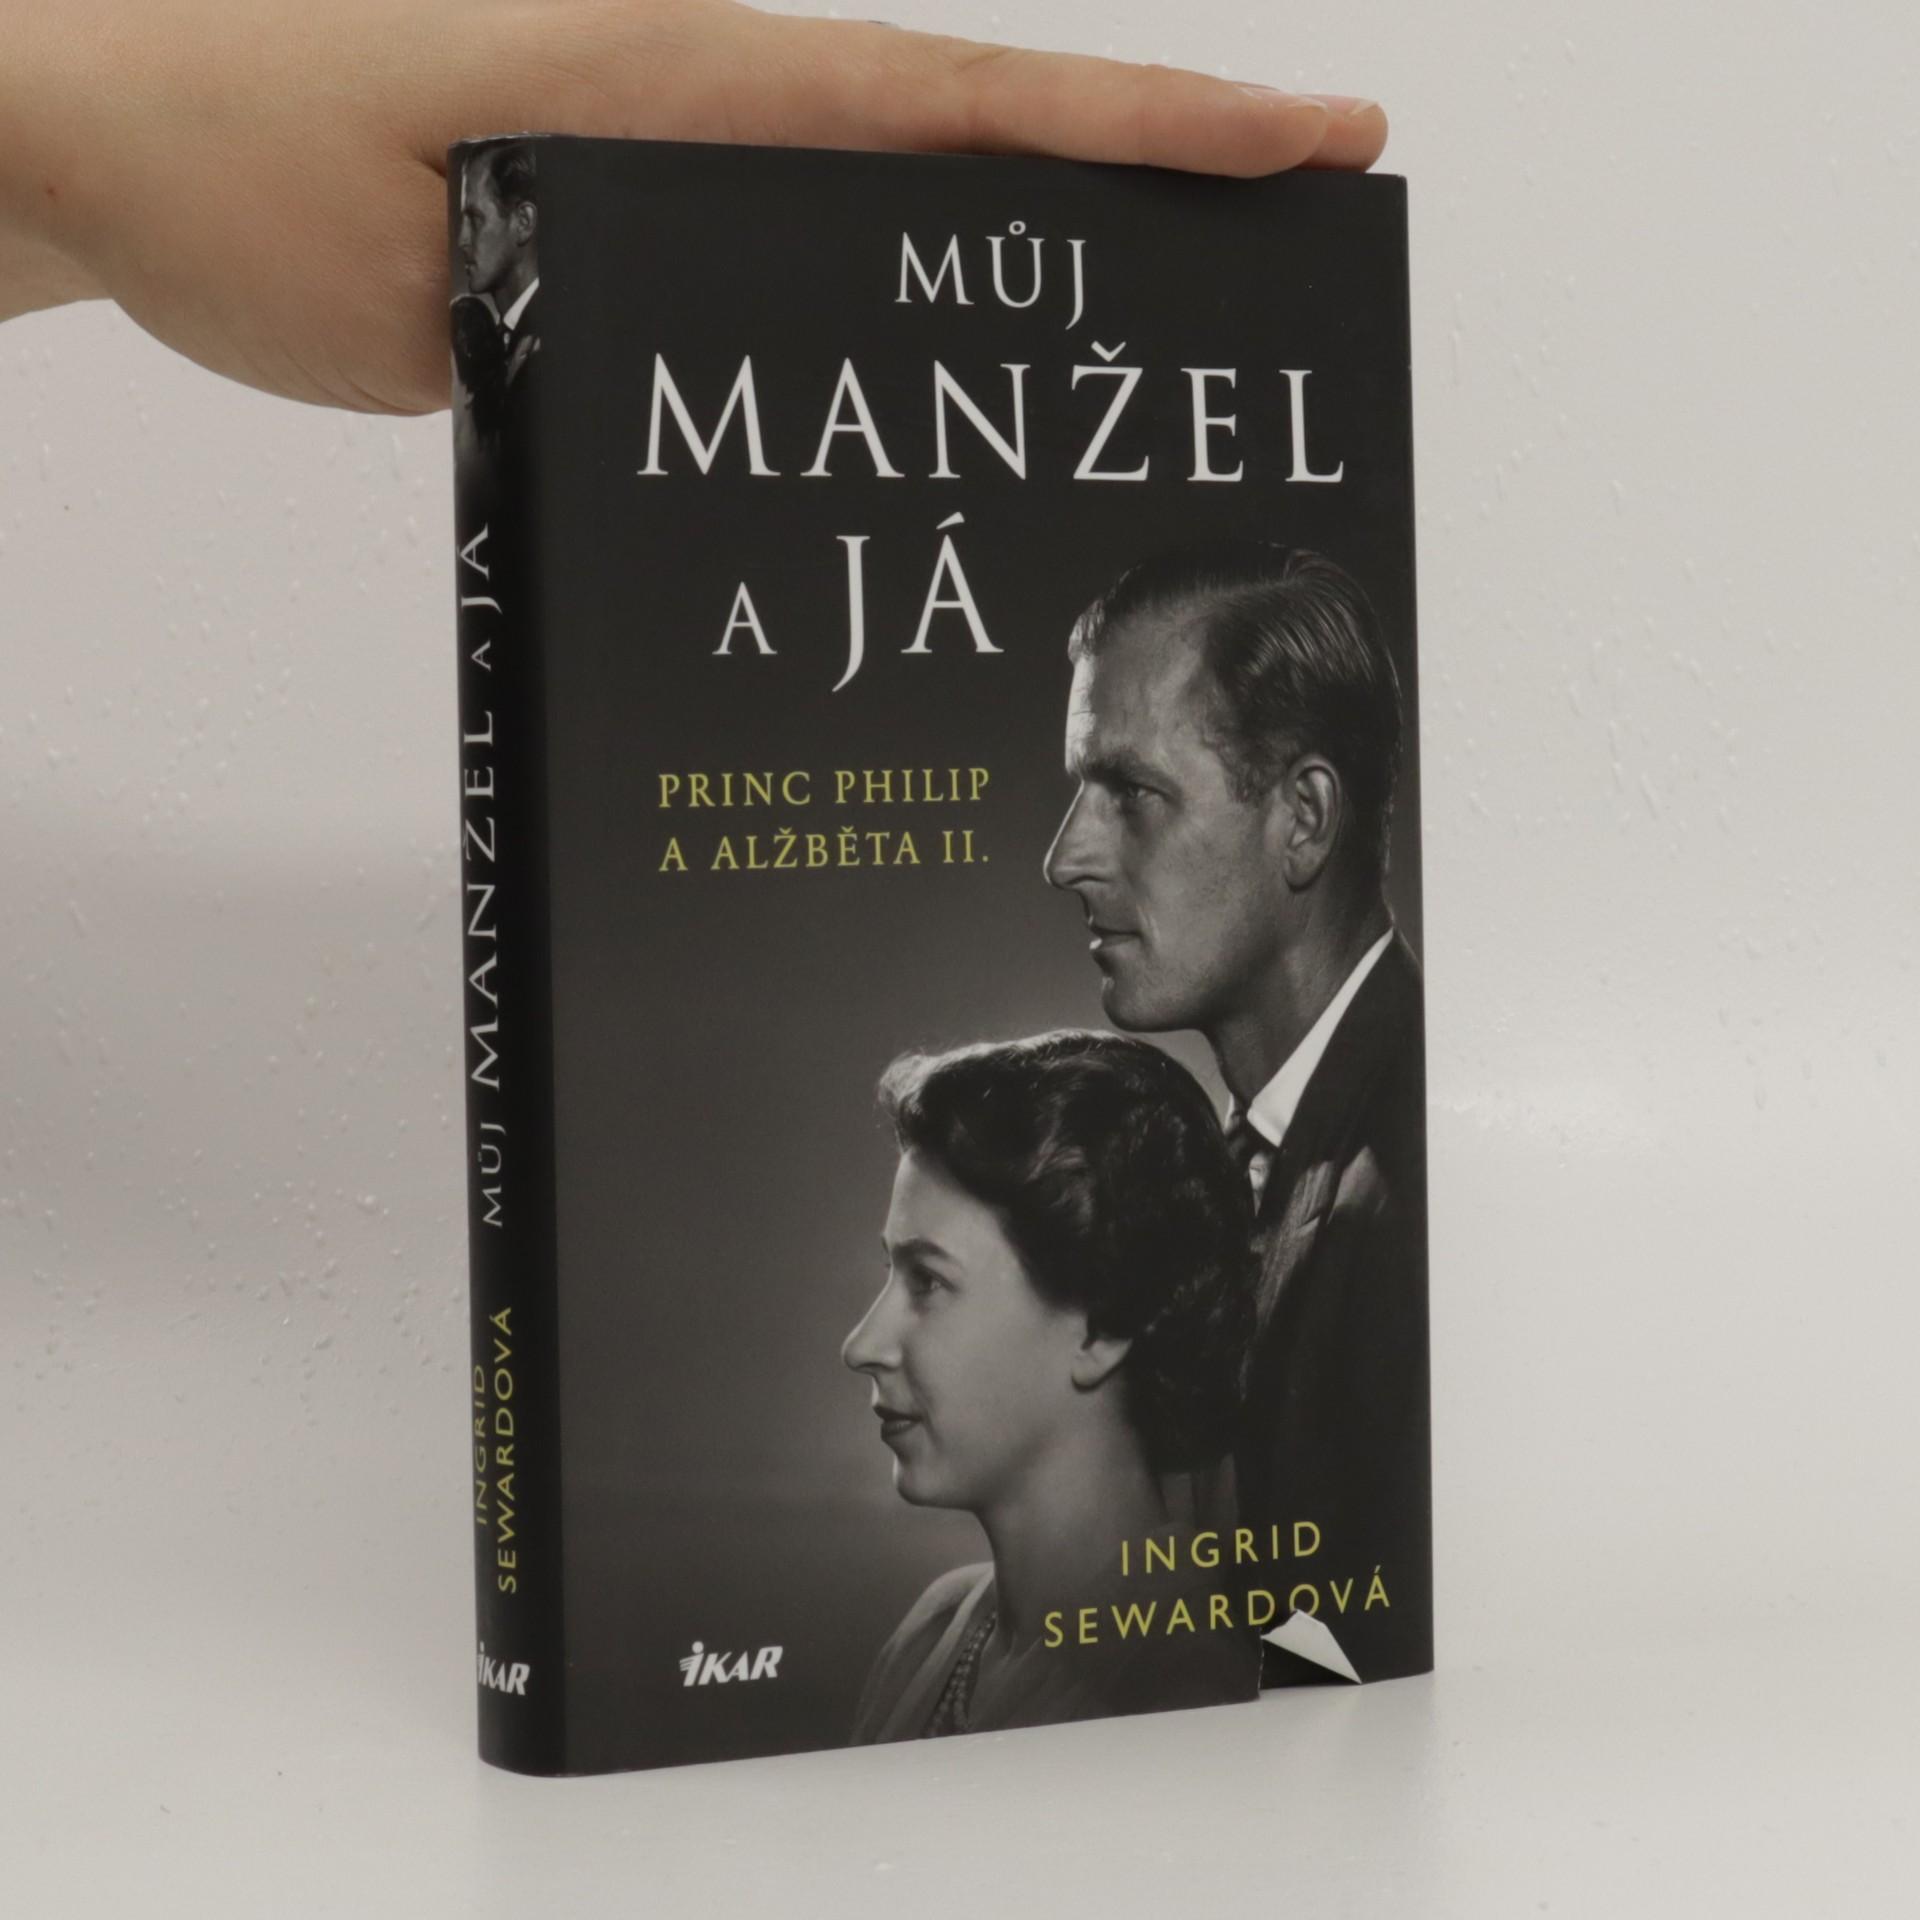 antikvární kniha Můj manžel a já : princ Philip a Alžběta II., 2018